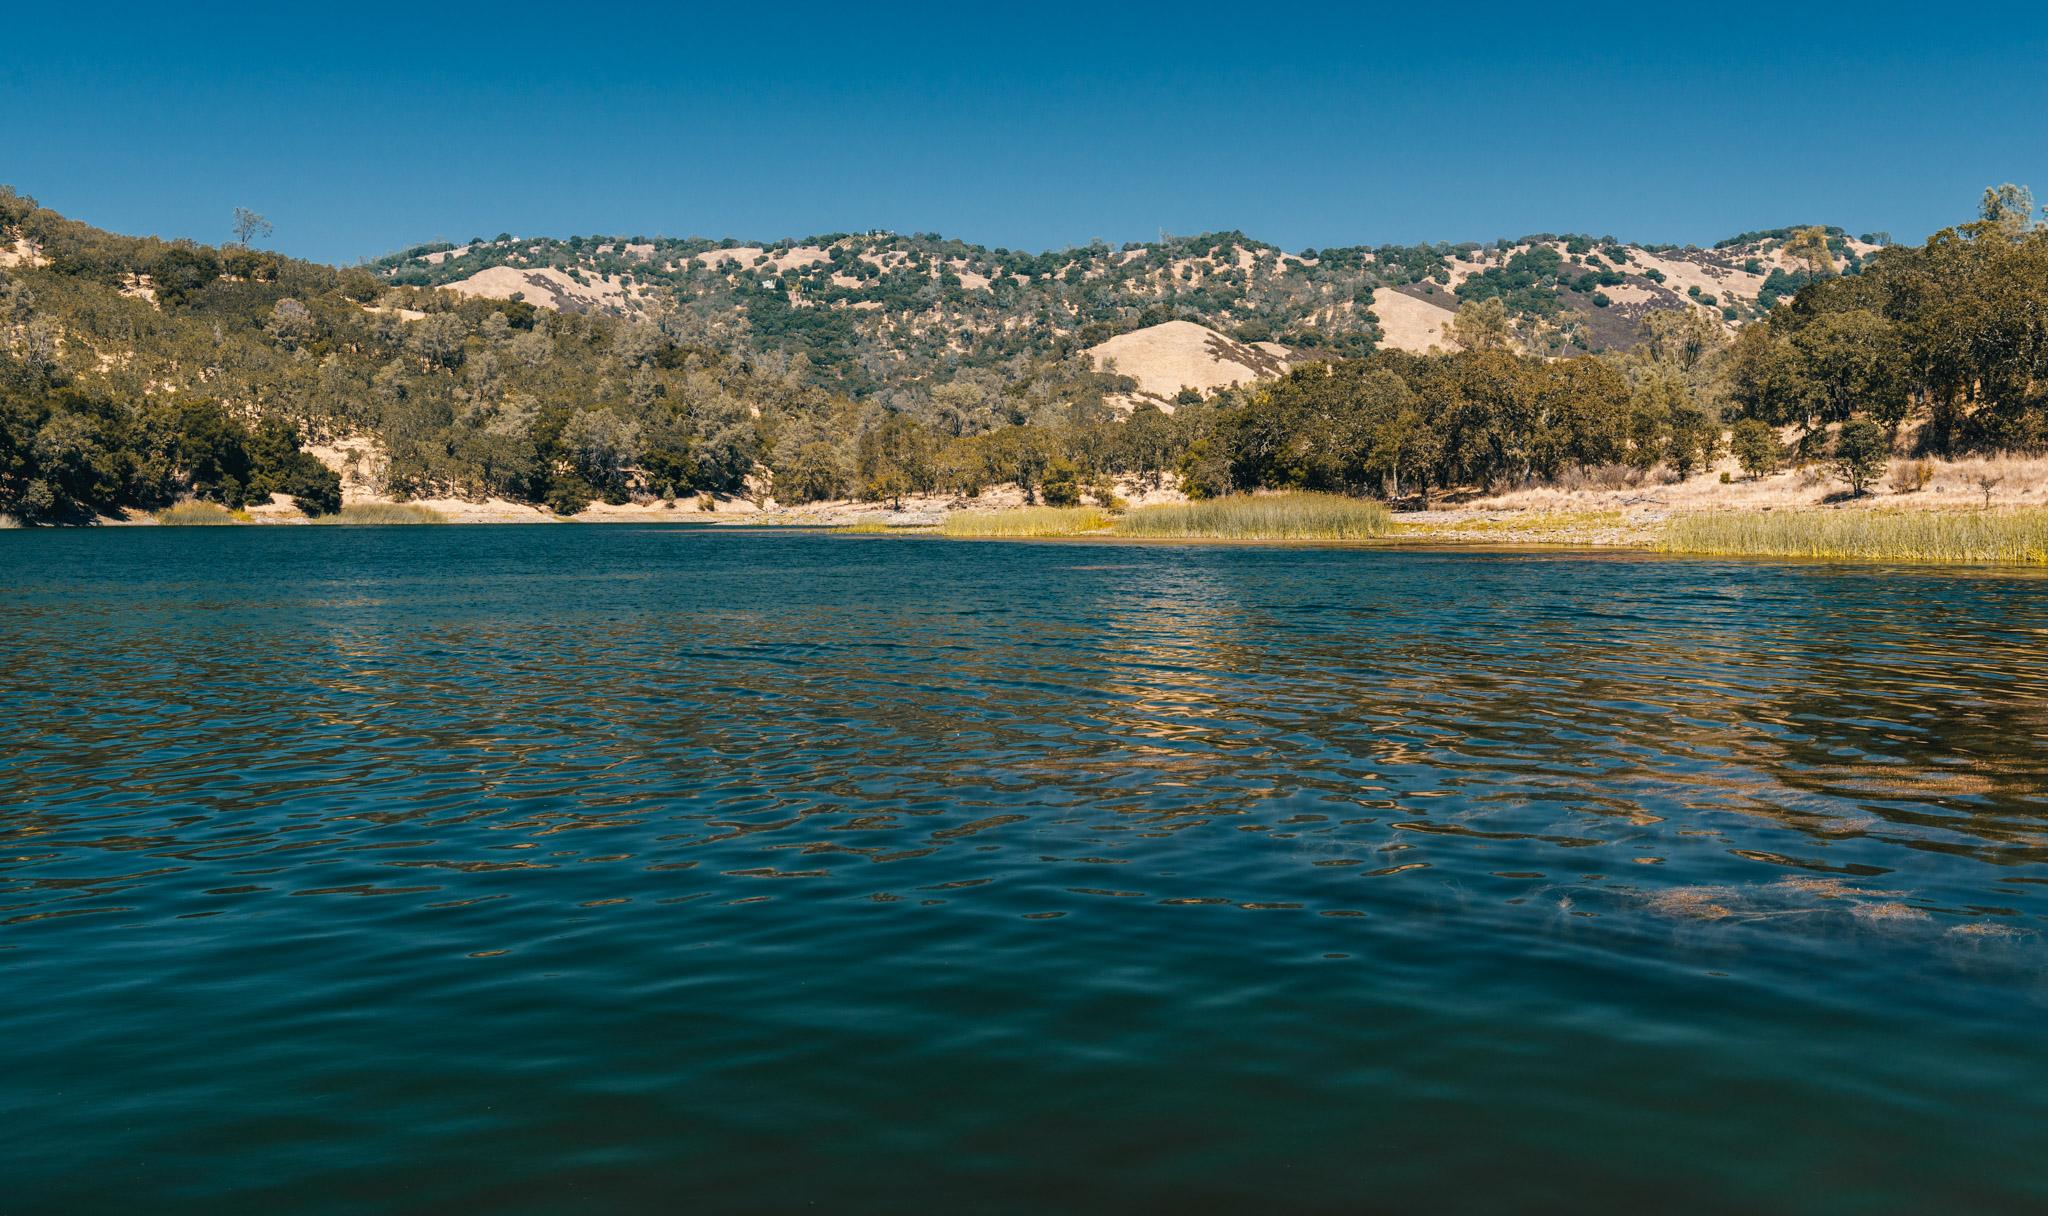 California : Napa Valley : Lake Hennessey